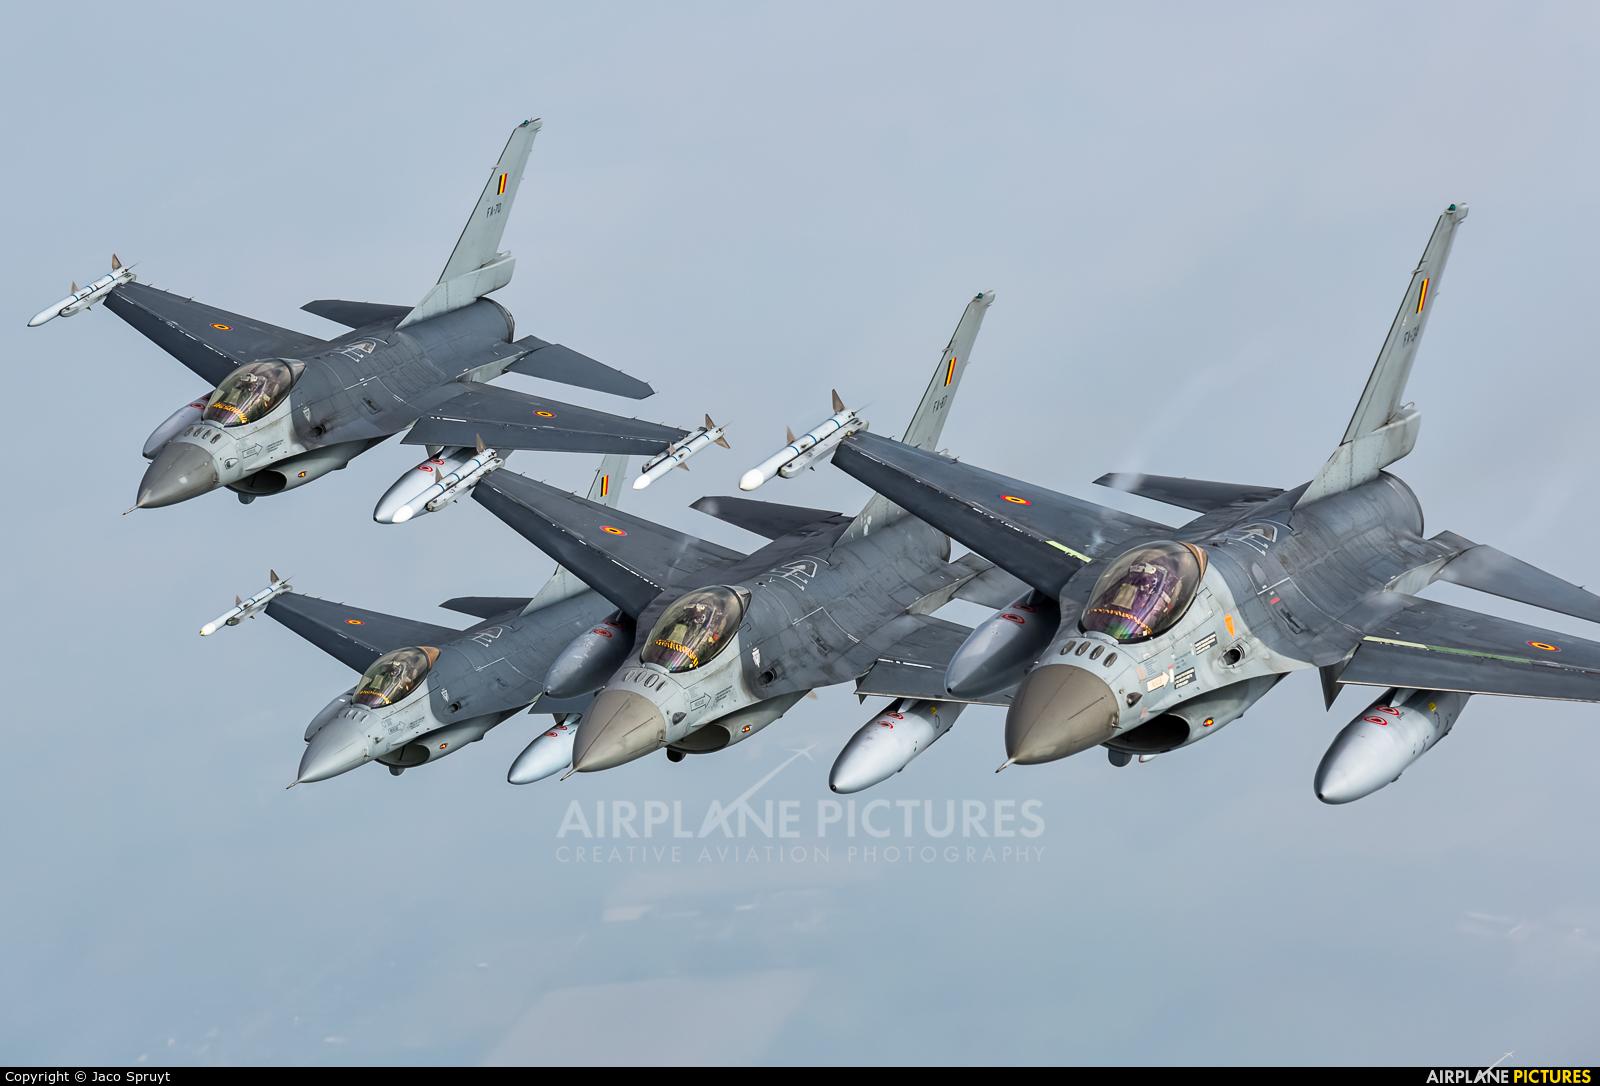 Belgium - Air Force - aircraft at In Flight - Belgium